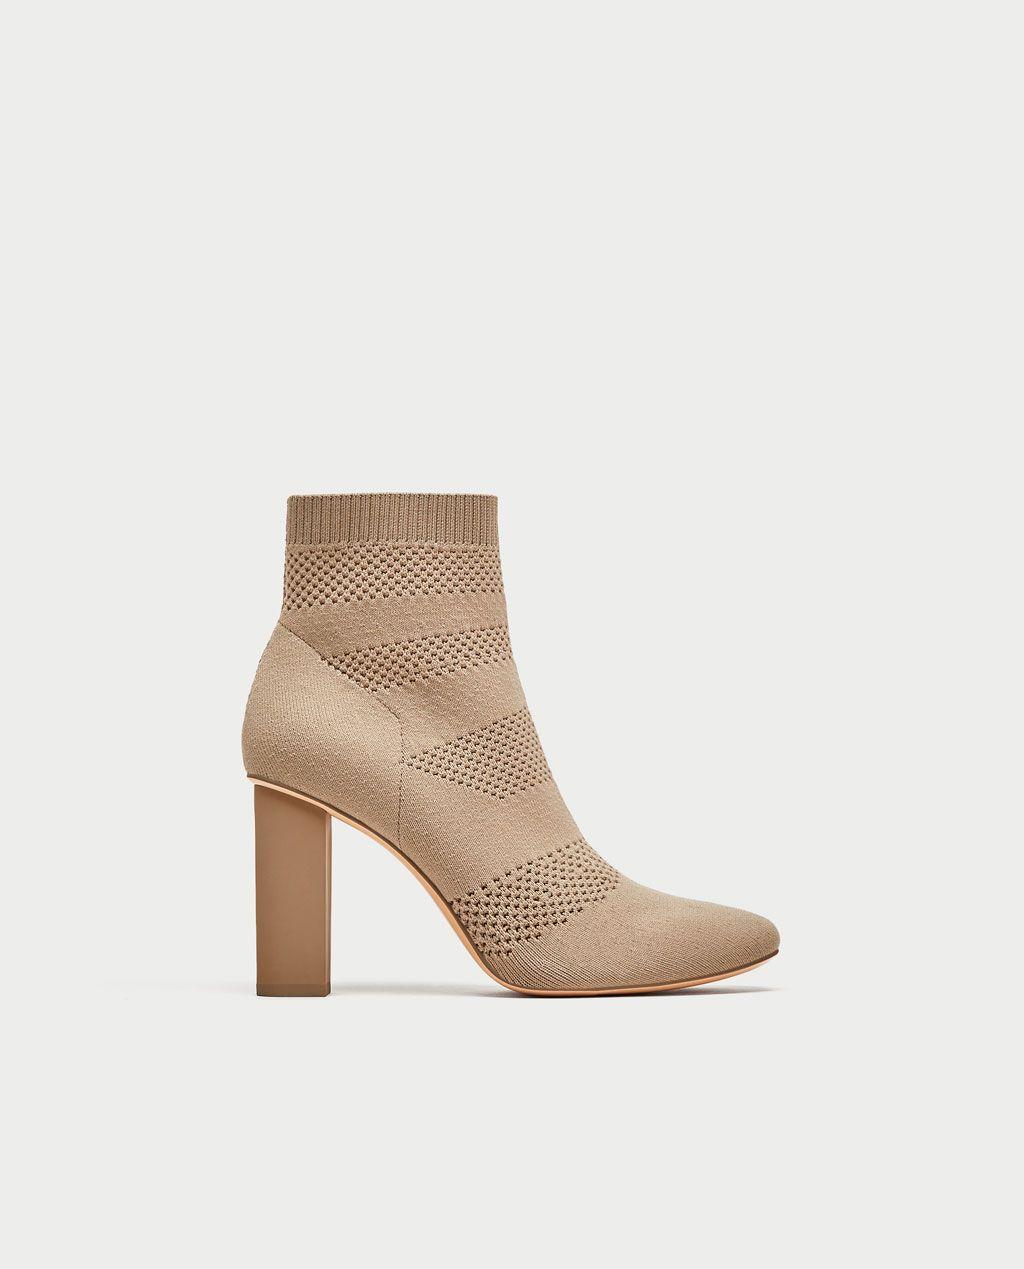 Steve Madden Women's Editt Ankle Boots B074PBQJ52